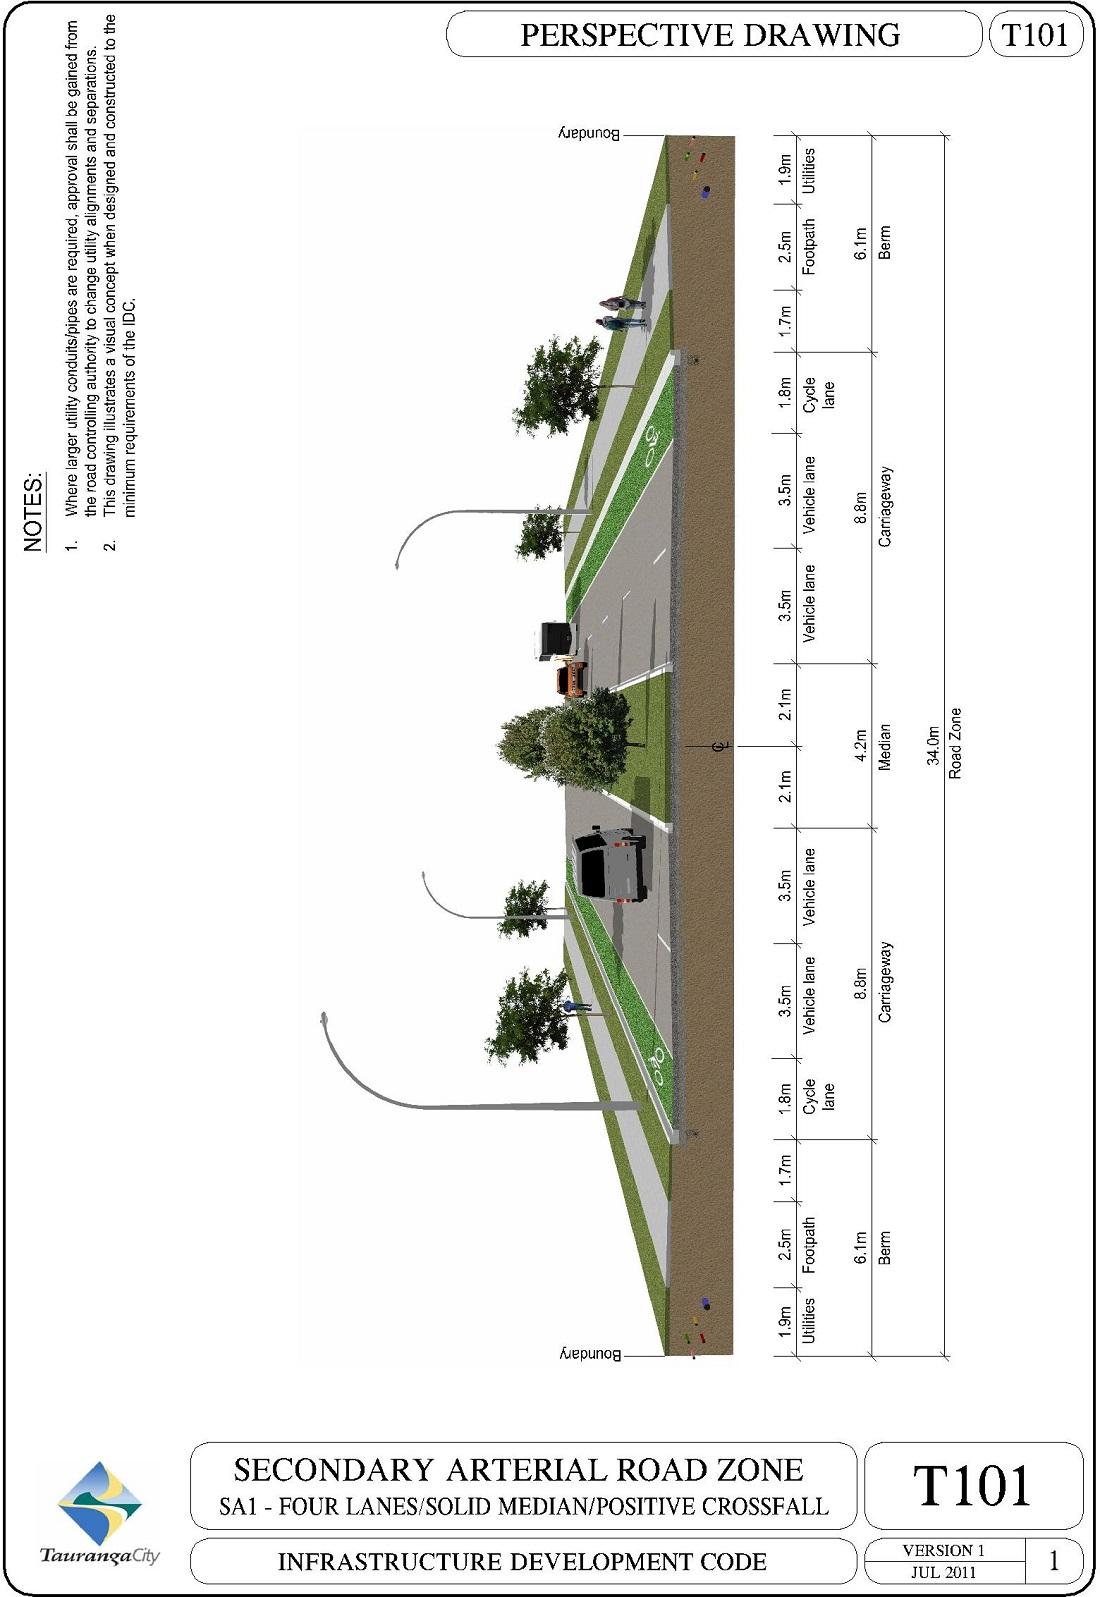 101-SA1-four Lanes/Solid Median/Positve Crossfall